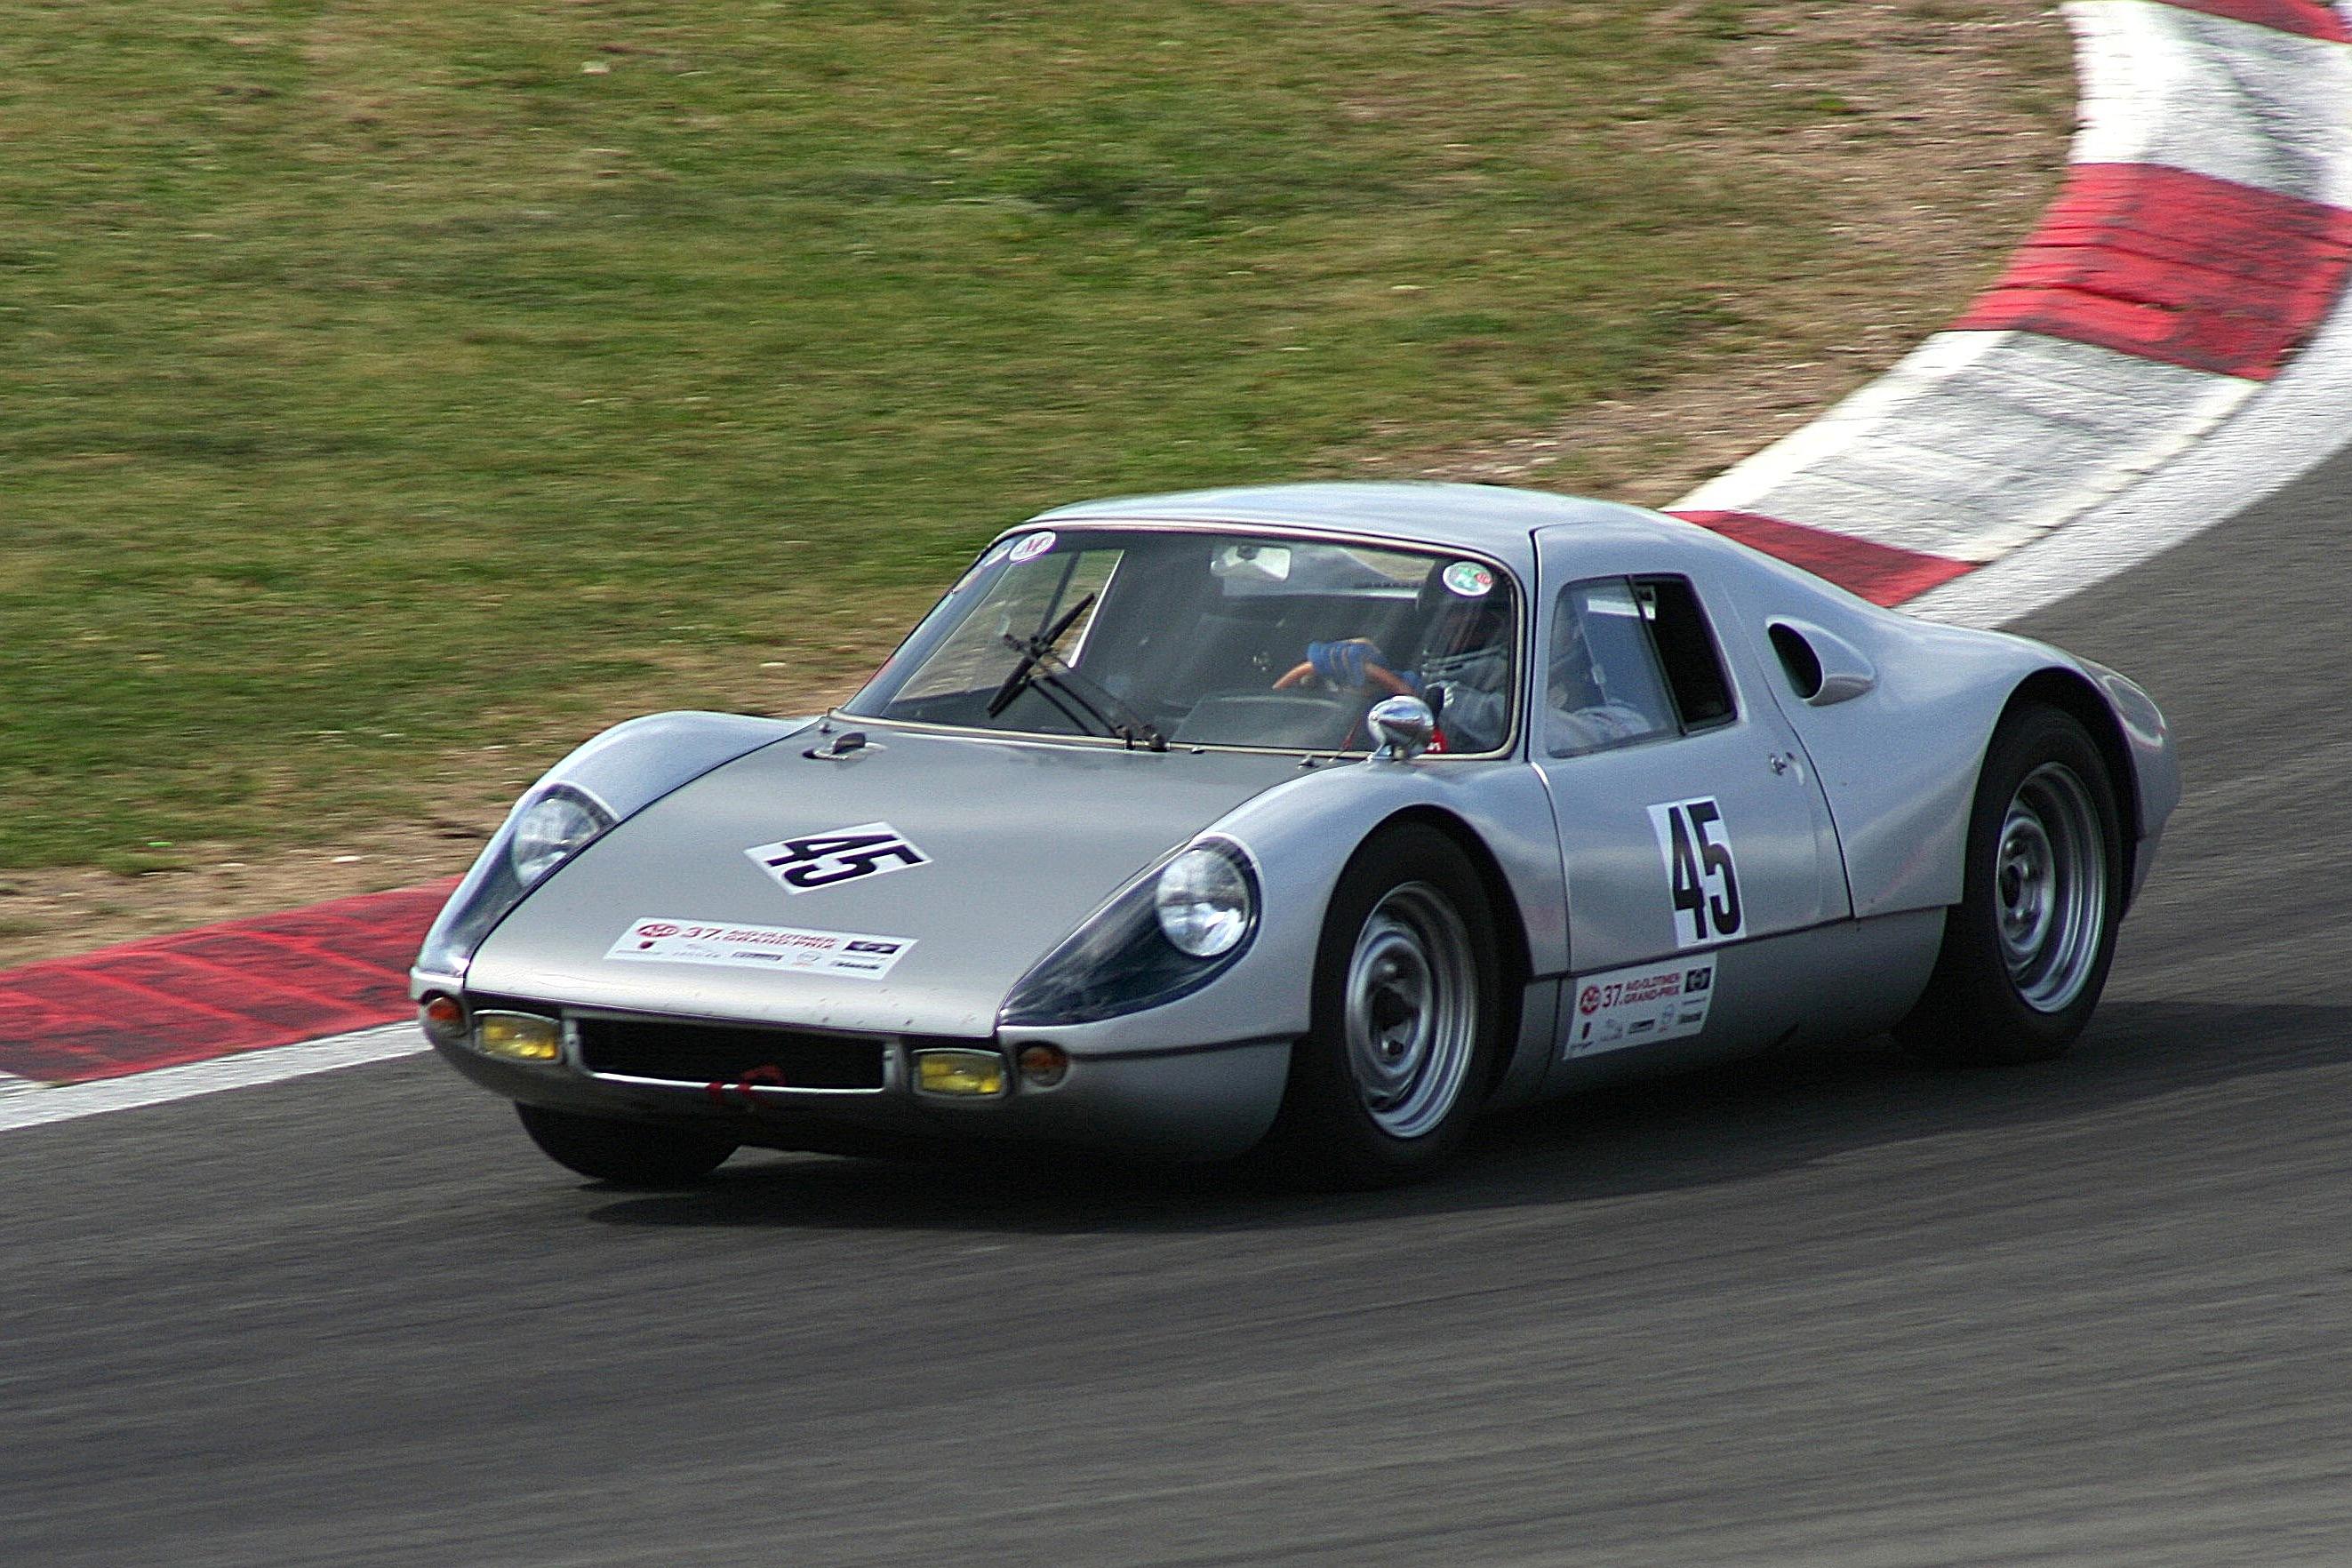 File Porsche 904 Bj 1964 2009 08 07 Sp Jpg Wikimedia Commons